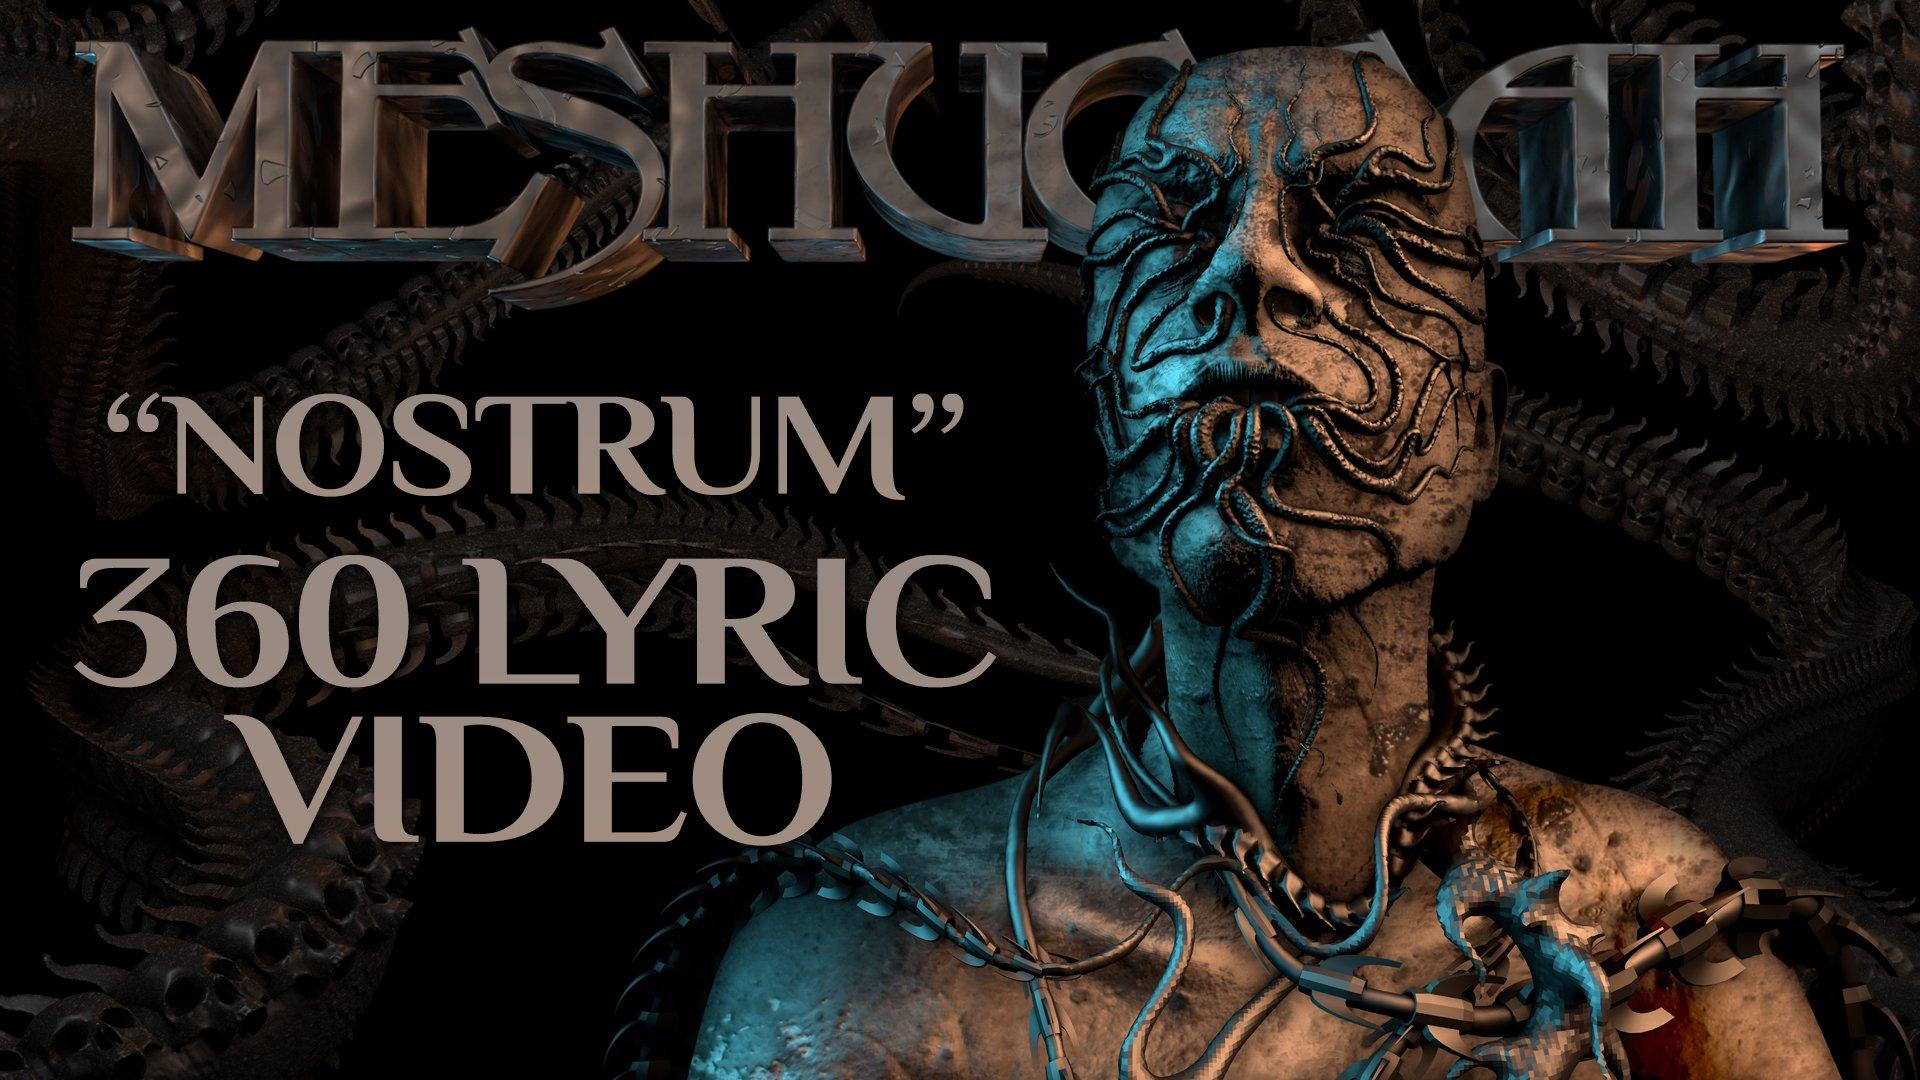 Meshuggah On Twitter Track Premiere 360 Lyric Video For